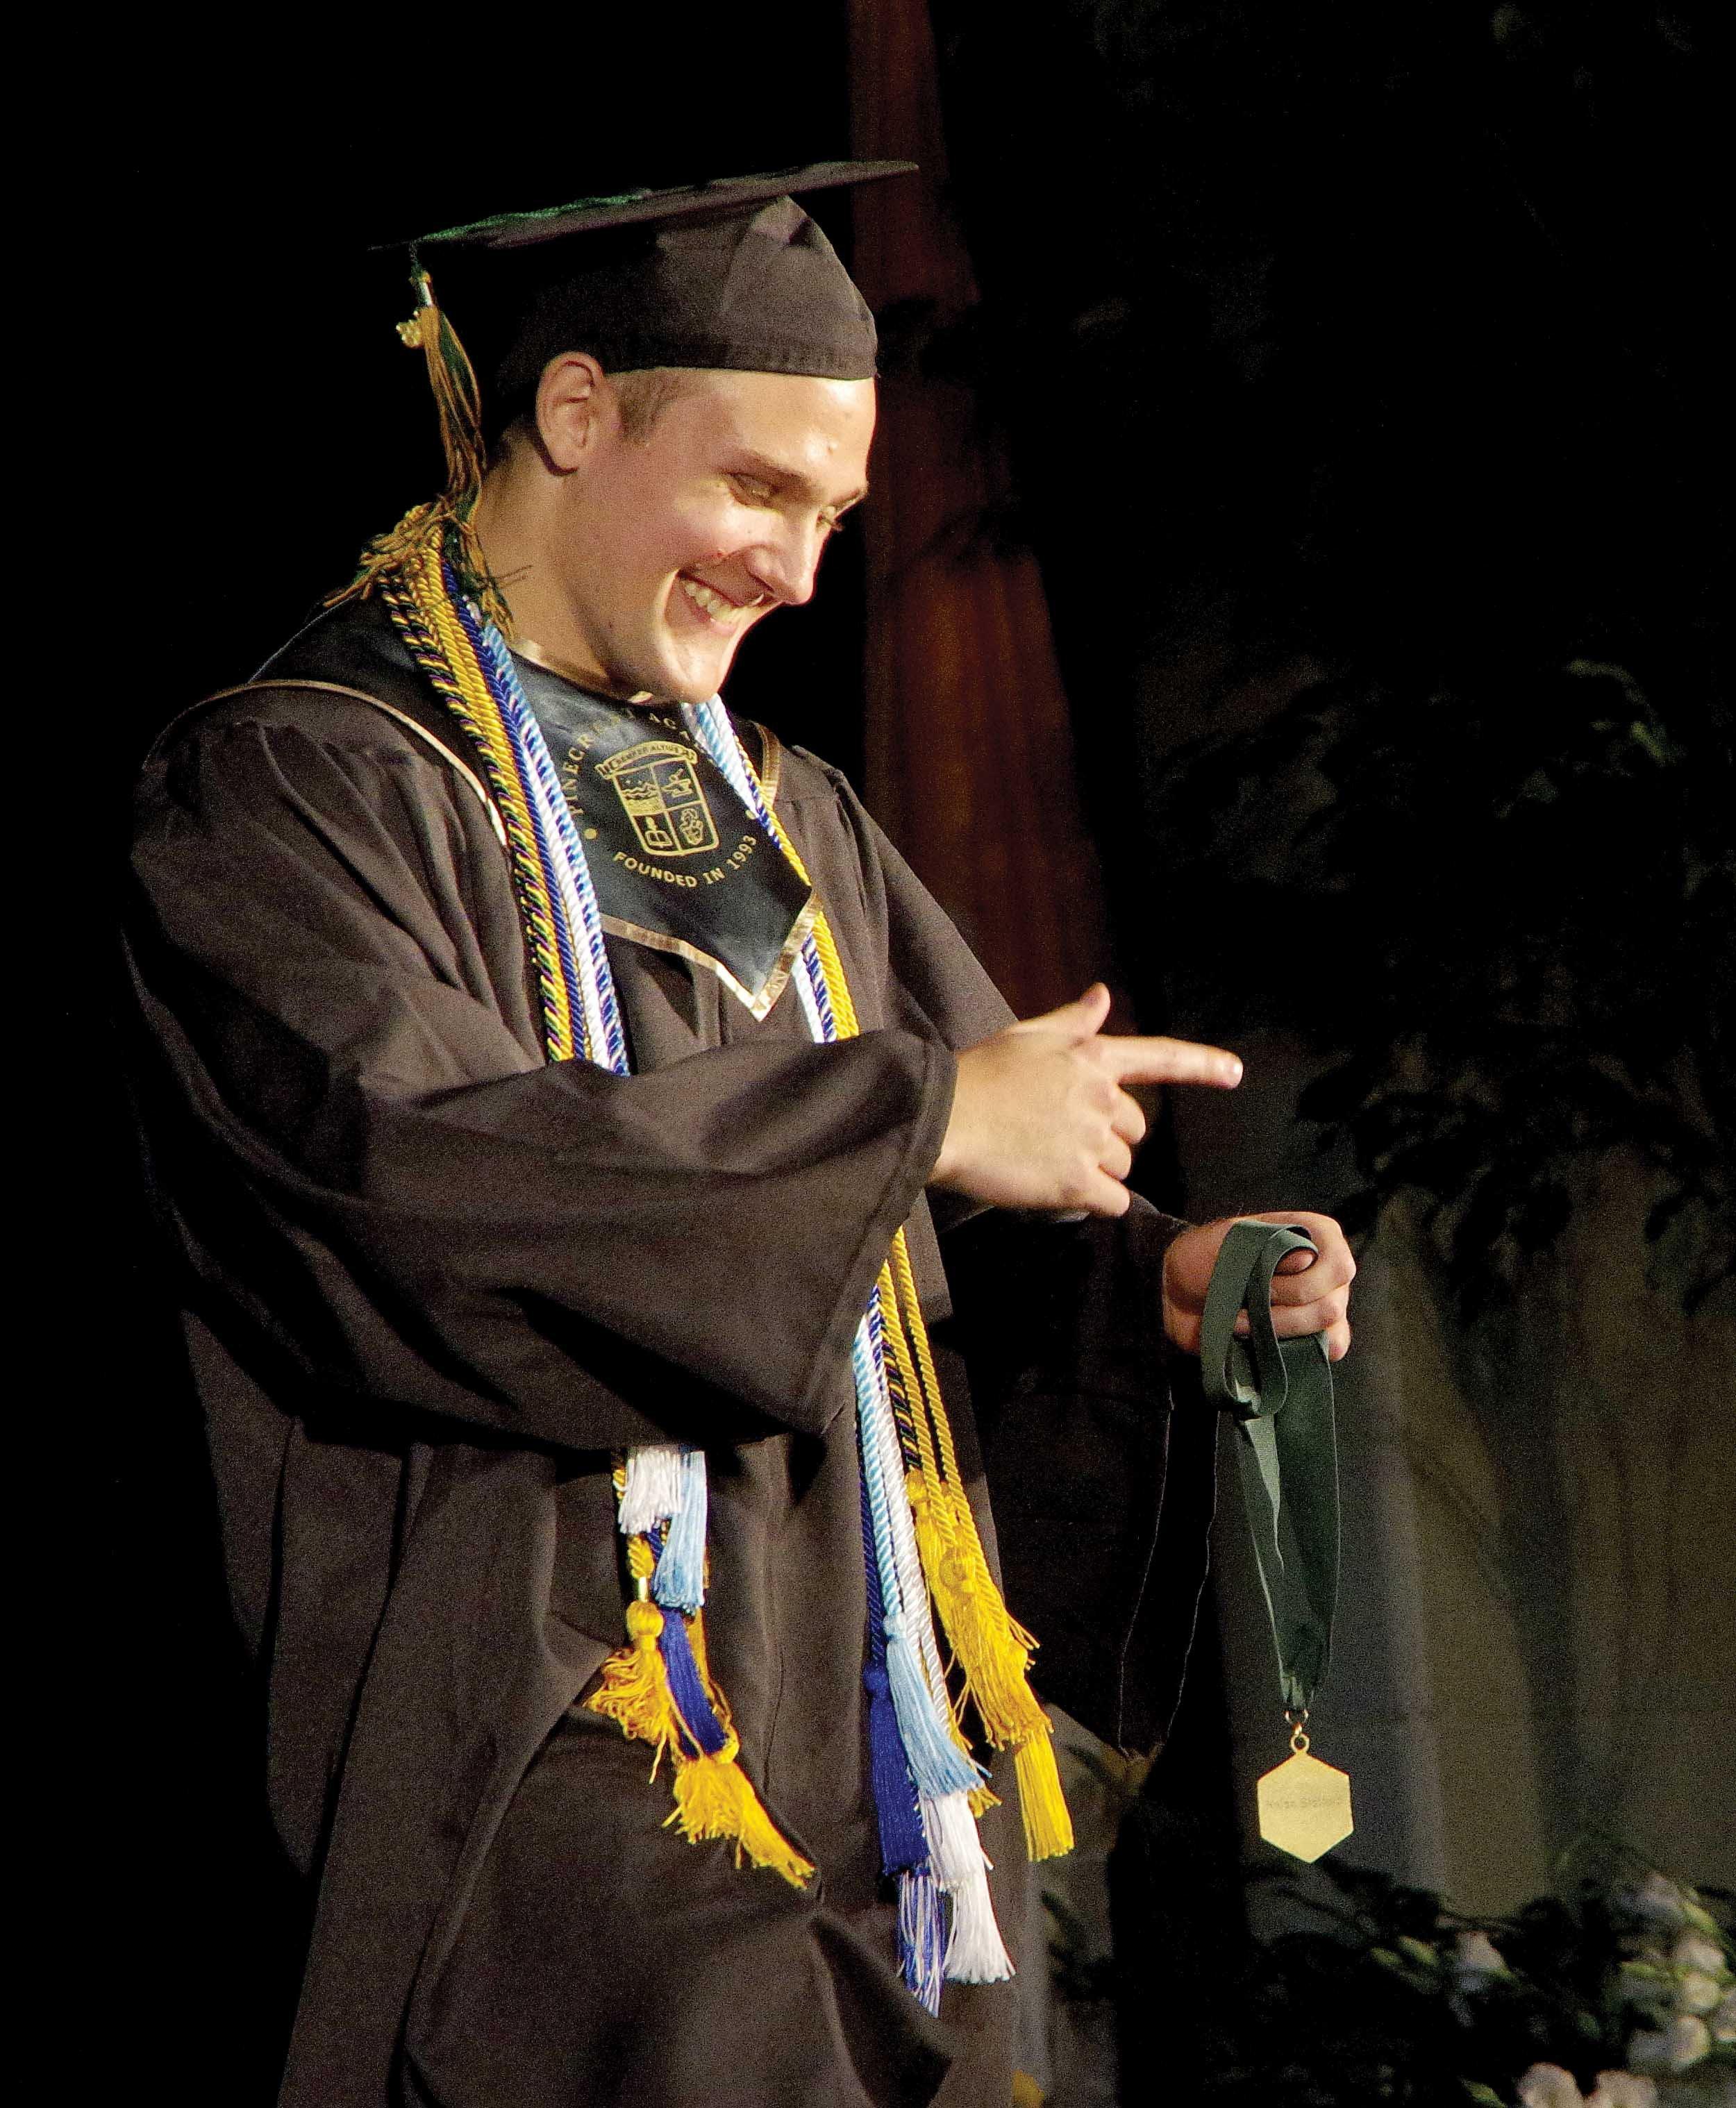 another happy graduate